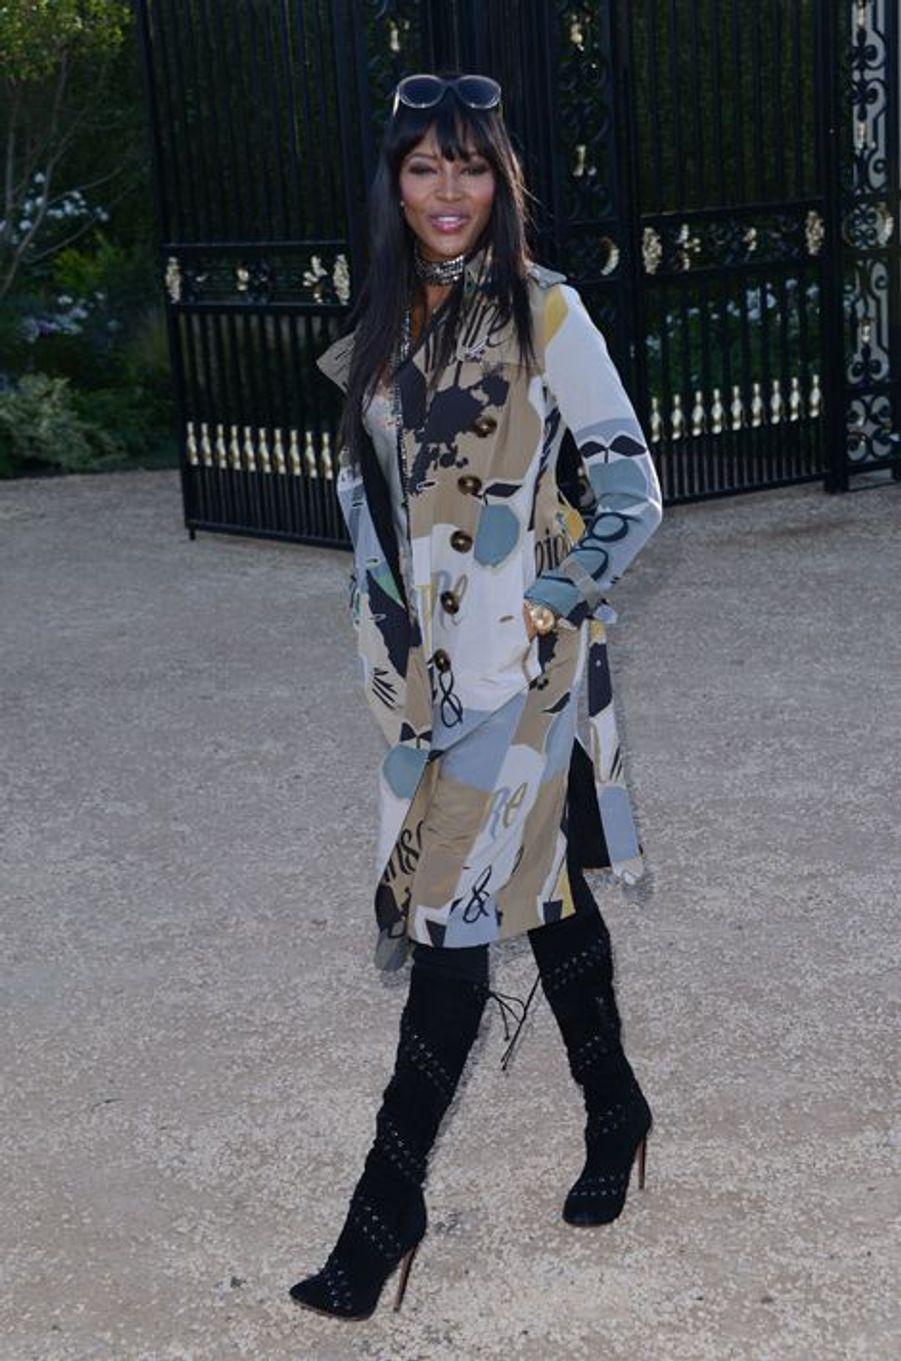 Naomi Campbell à Los Angeles le 16 avril 2015